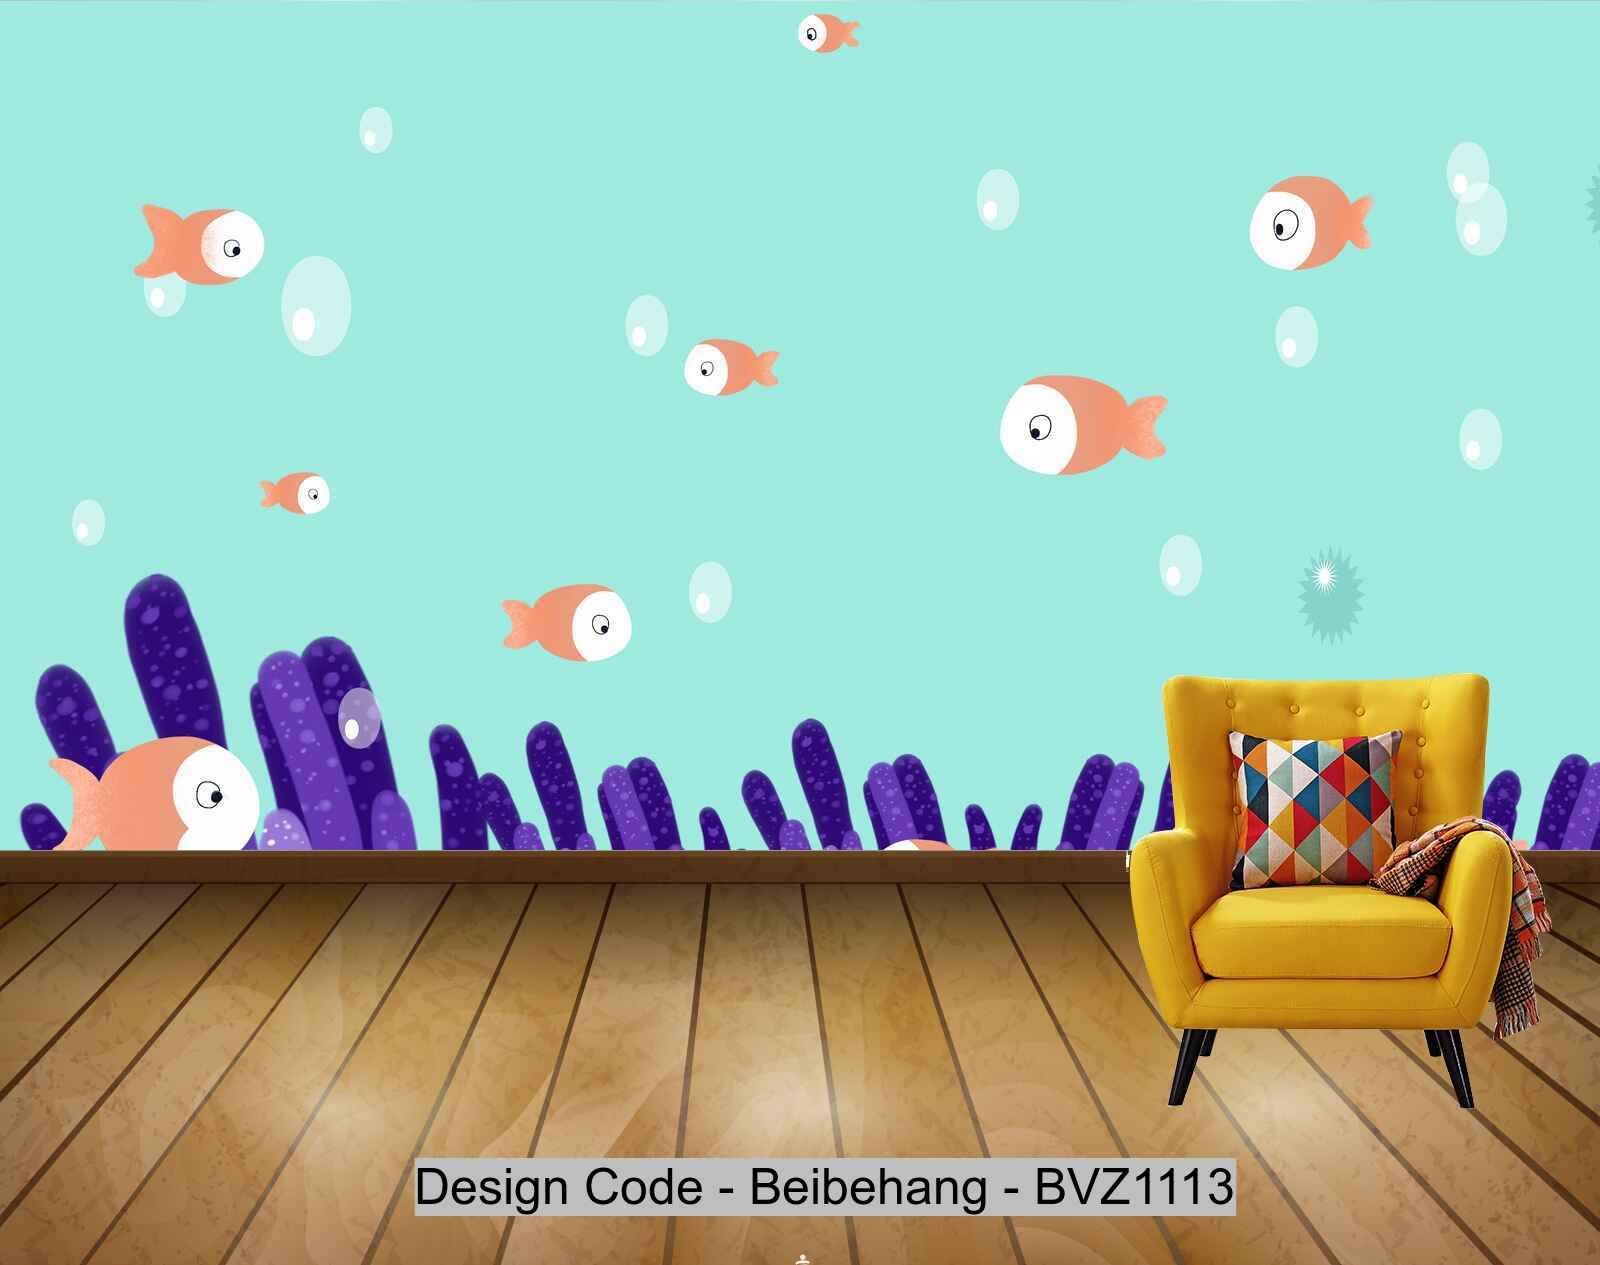 Pin On 3d Wallpaper For Kids Room 3d wallpaper designs for kids room